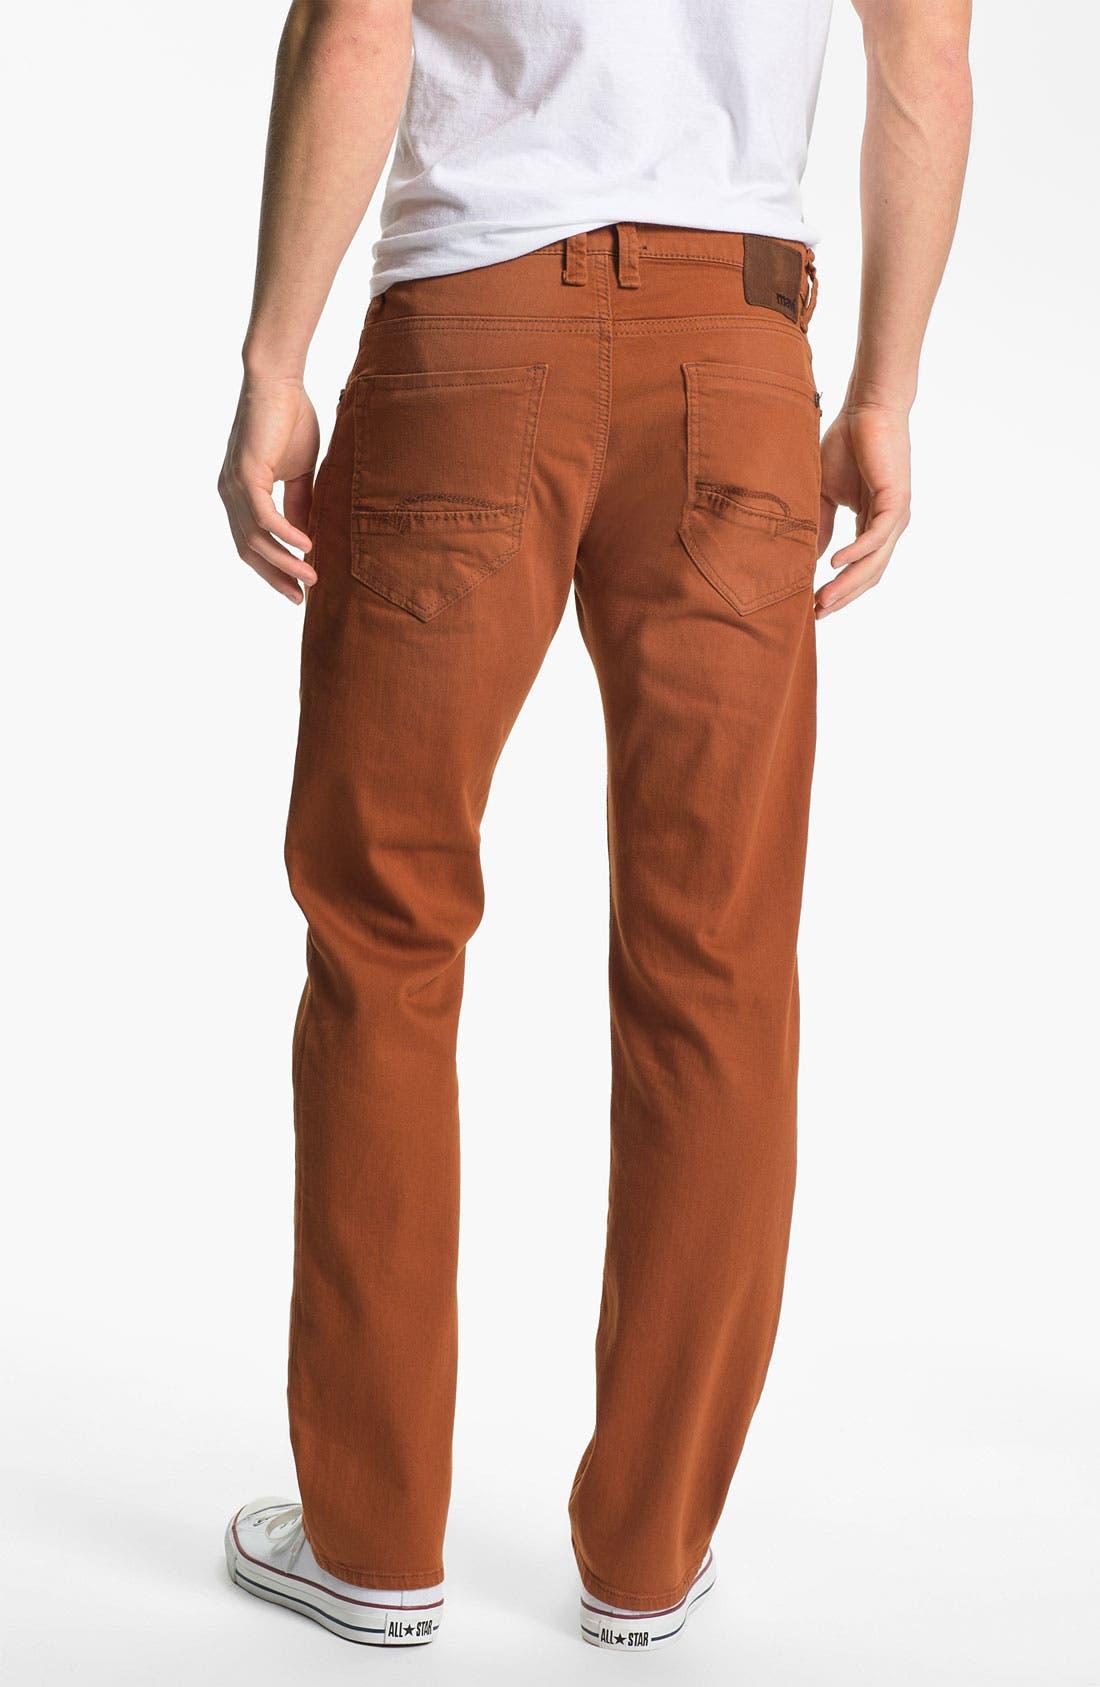 Alternate Image 1 Selected - Mavi Jeans 'Zach' Straight Leg Jeans (Orange)